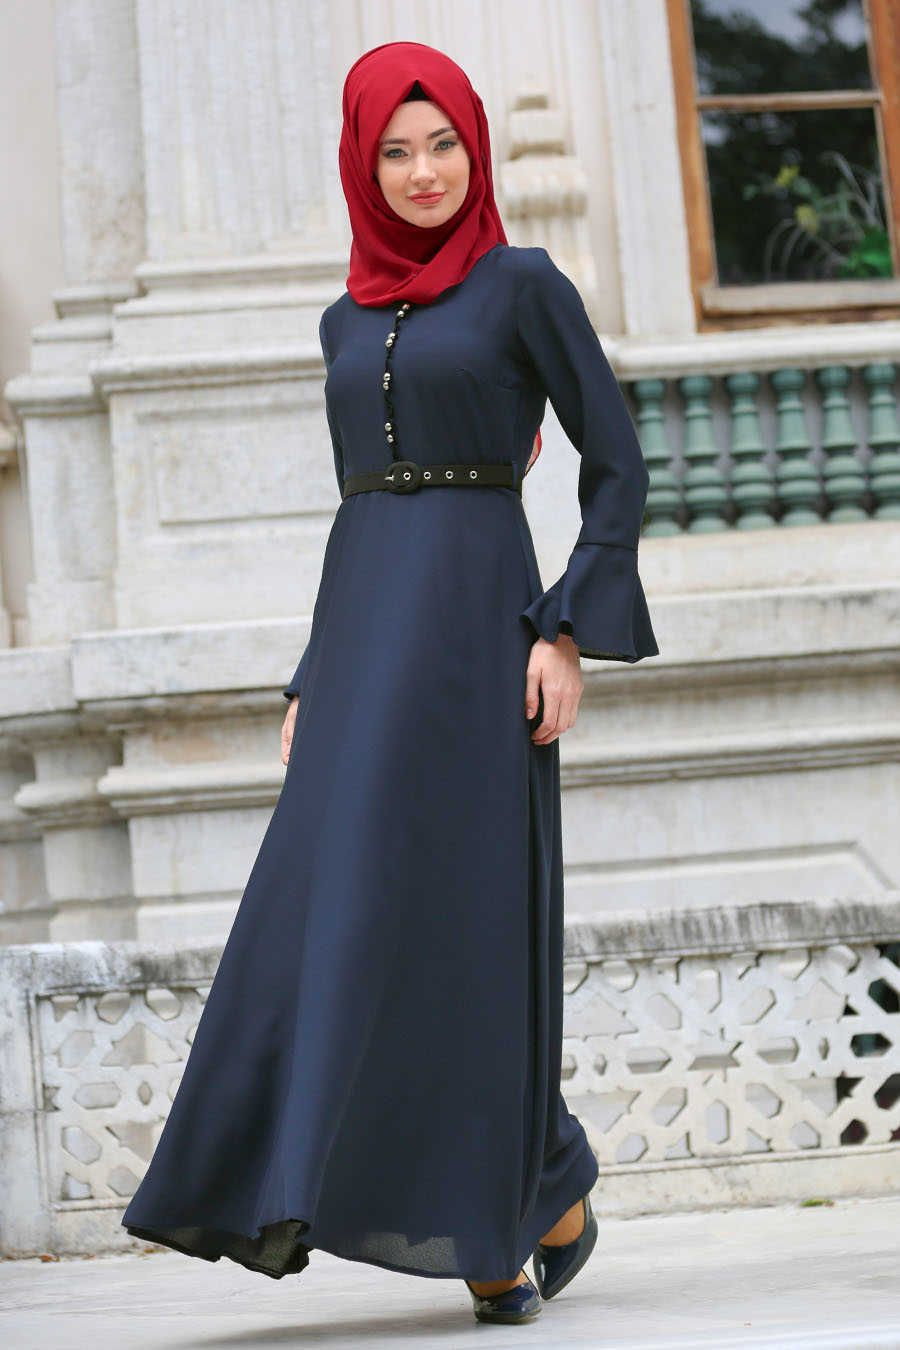 488158a983 Neva Style - Navy Blue Hijab Evening Dress 4809L in 2019 | Muslim ...